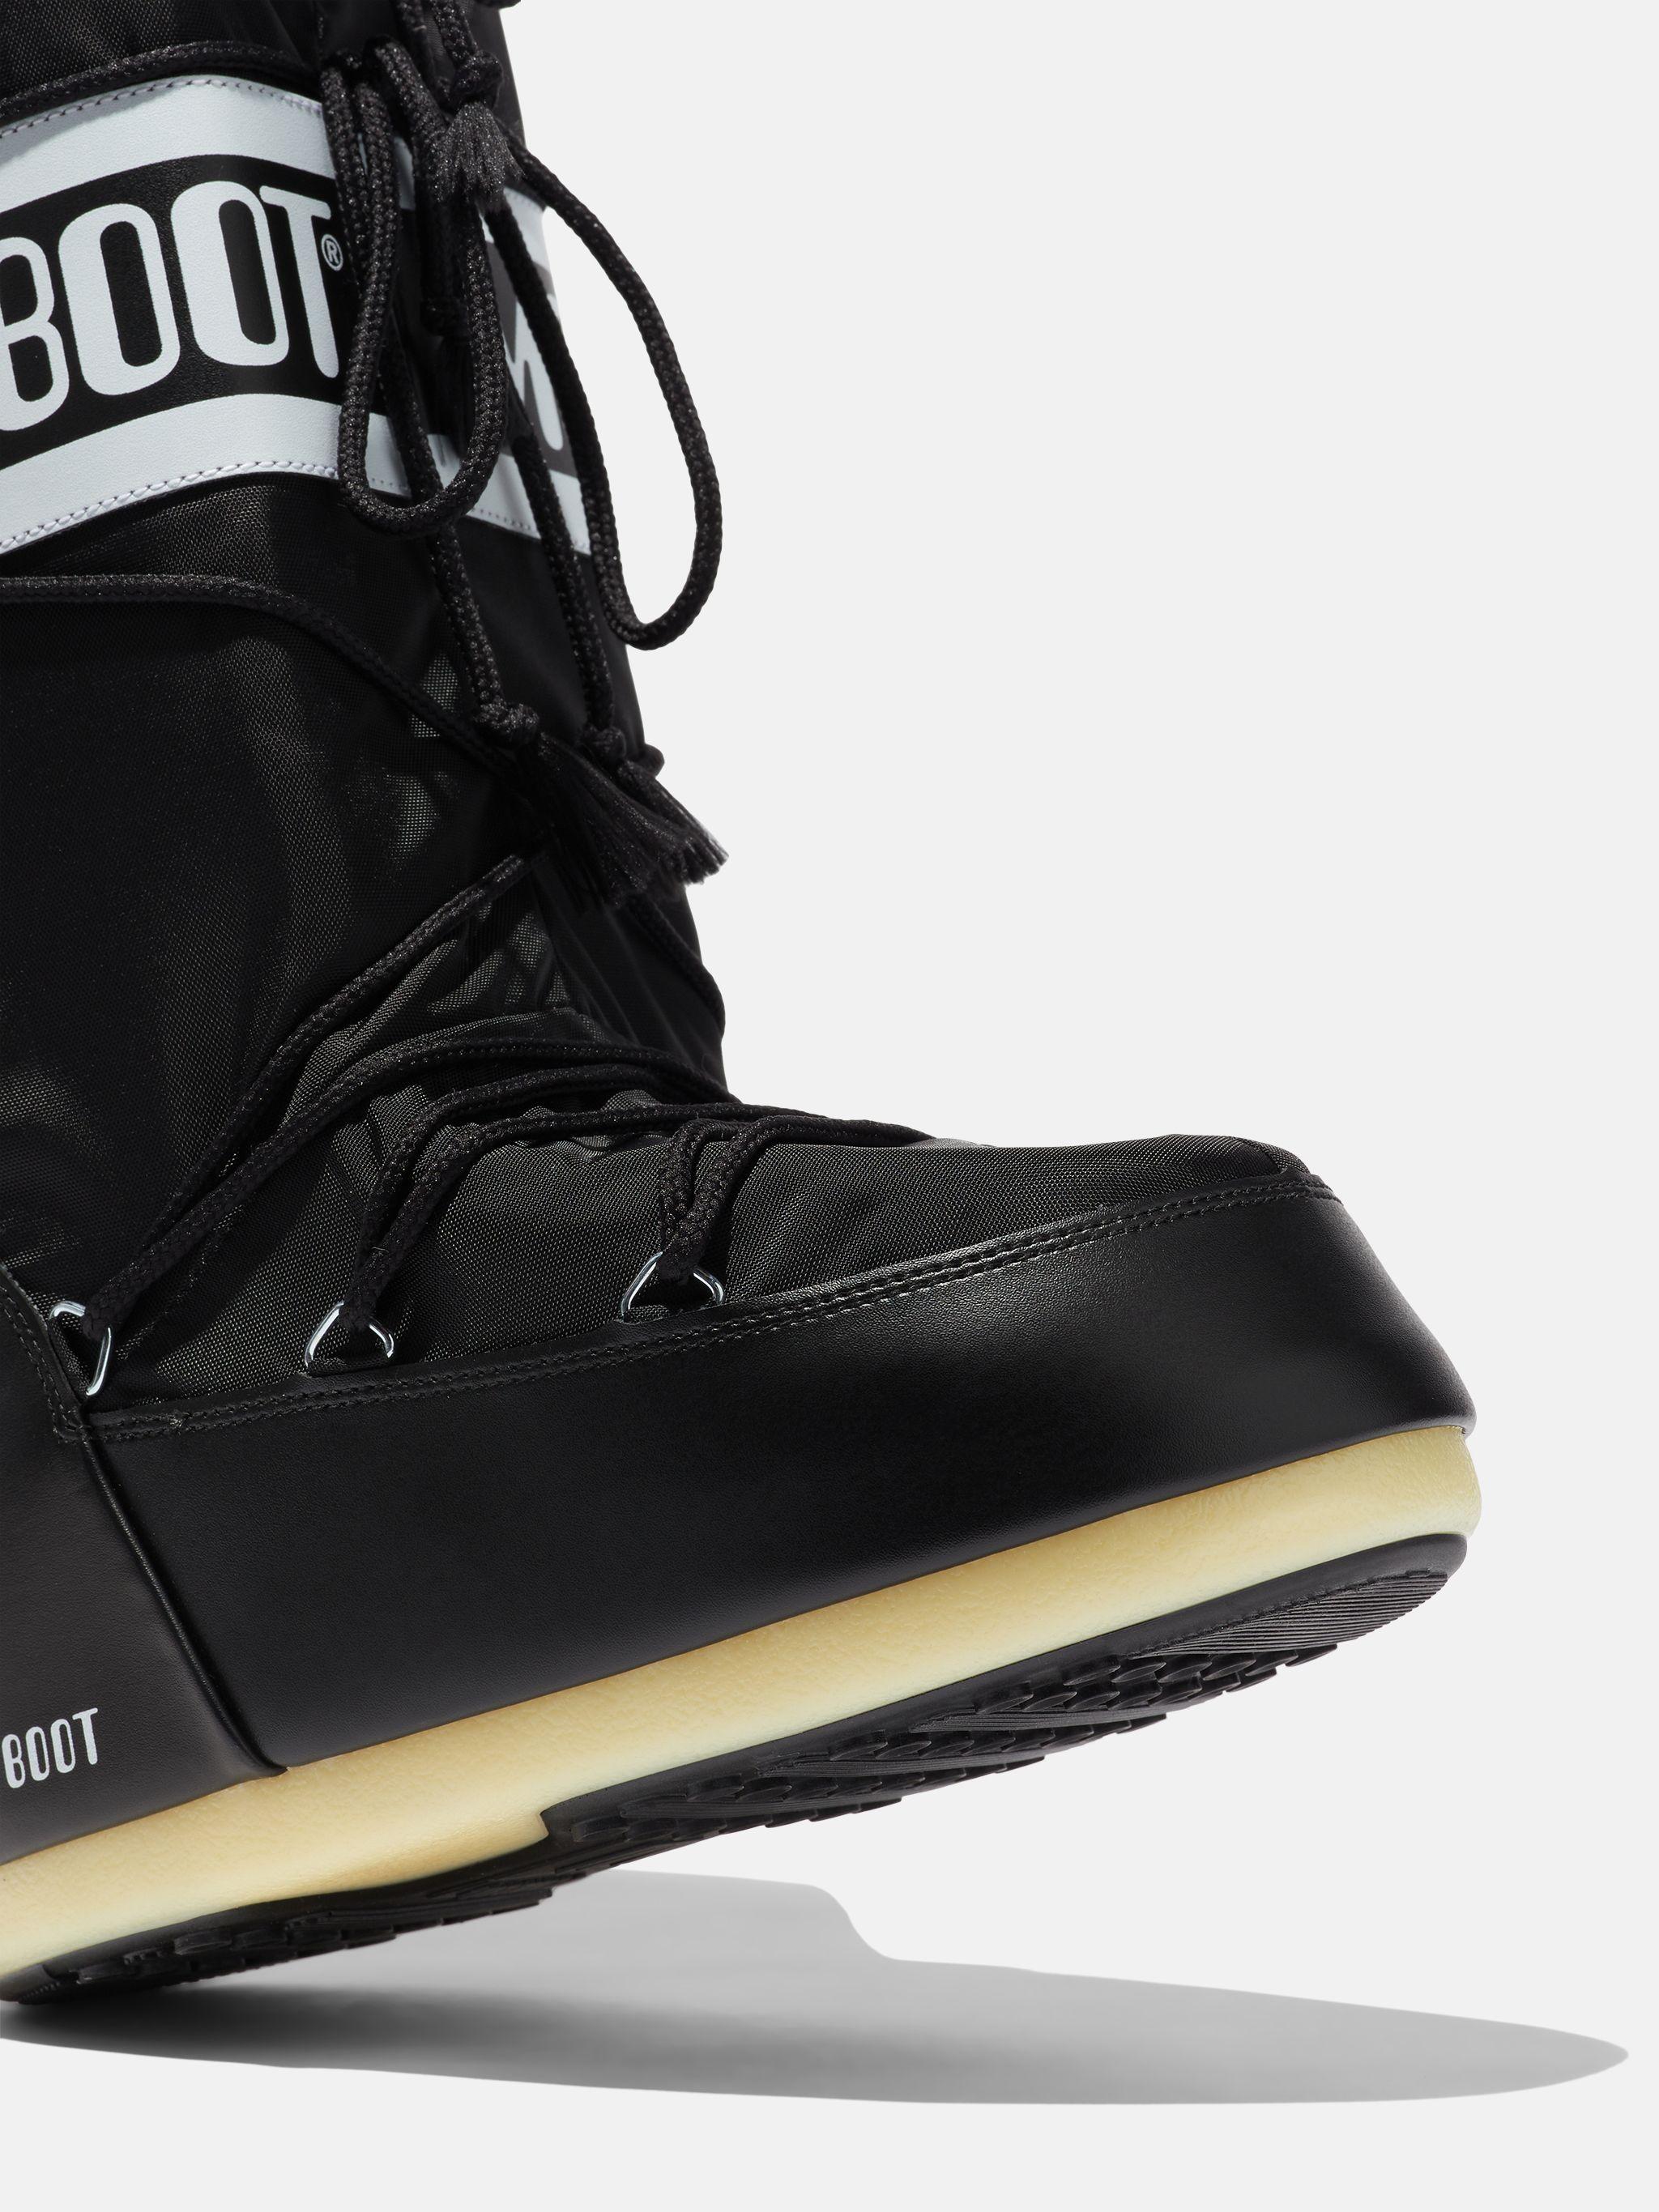 ICON BLACK NYLON BOOTS